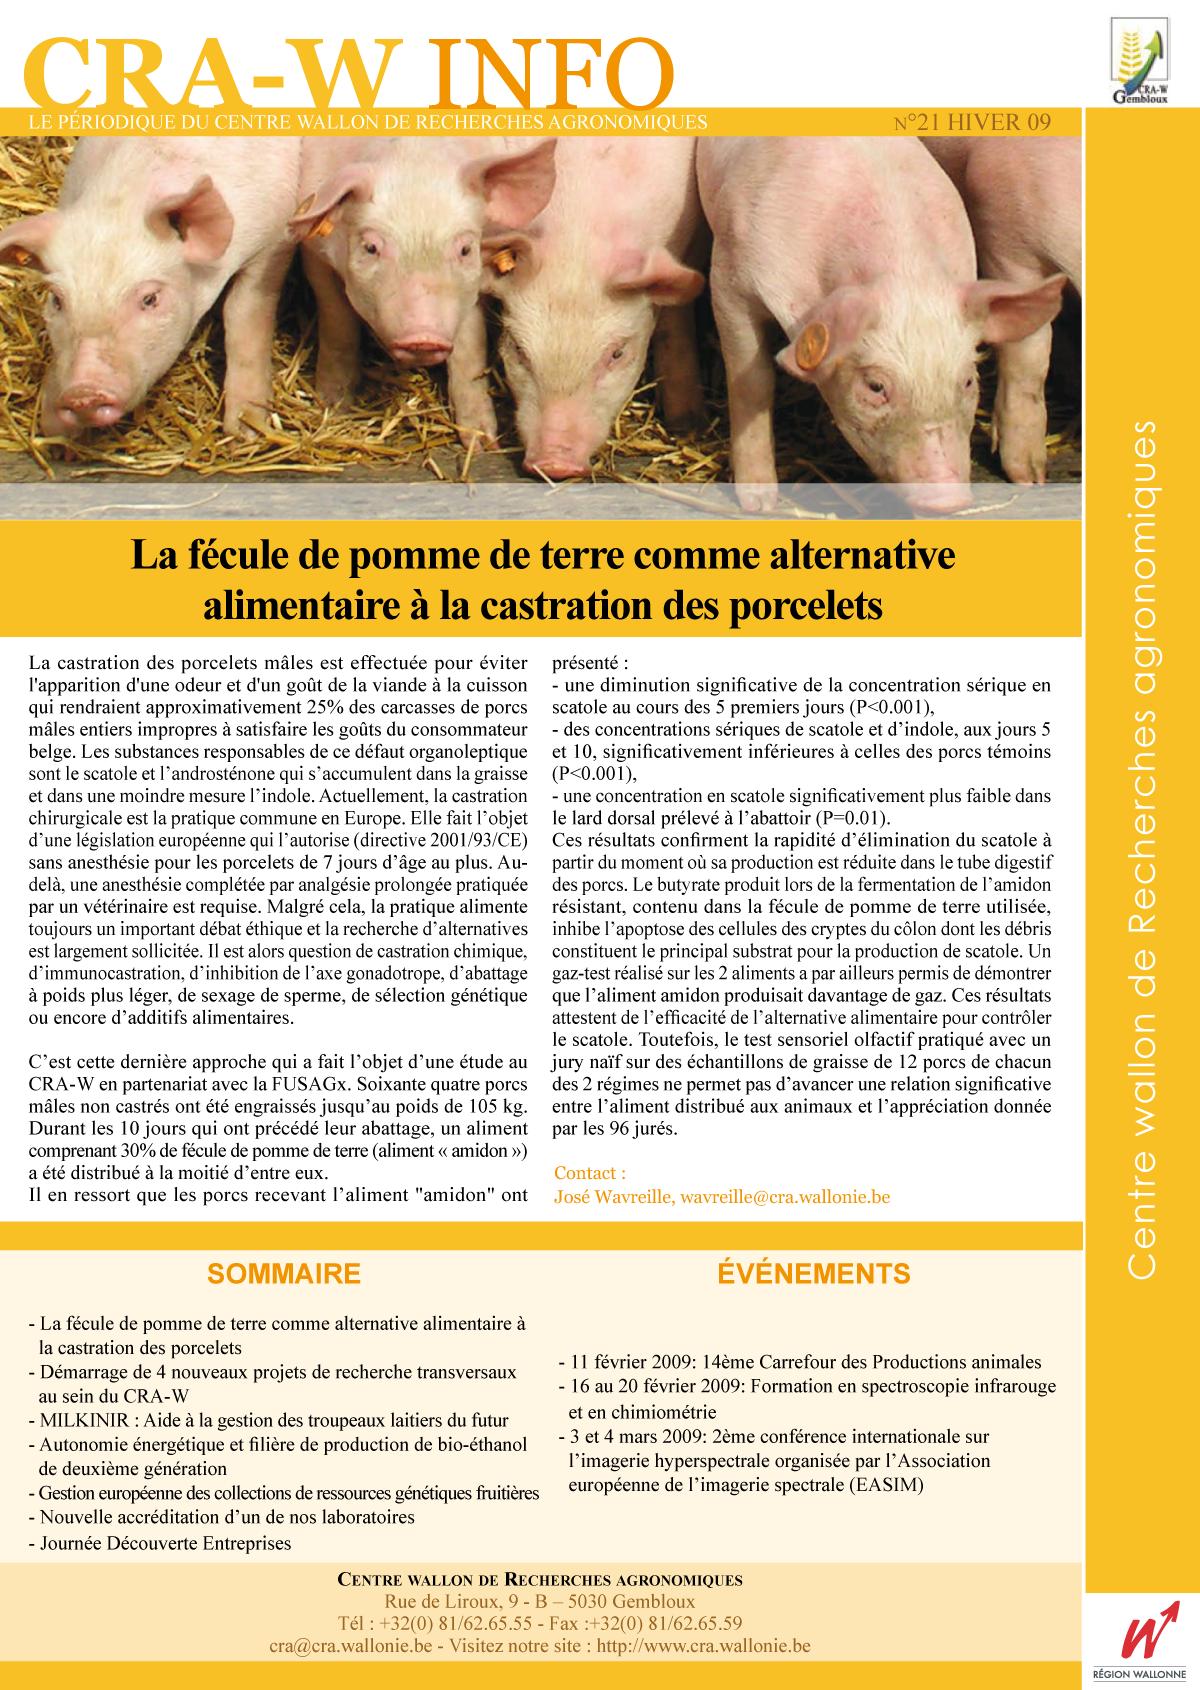 CRAW info n° 21